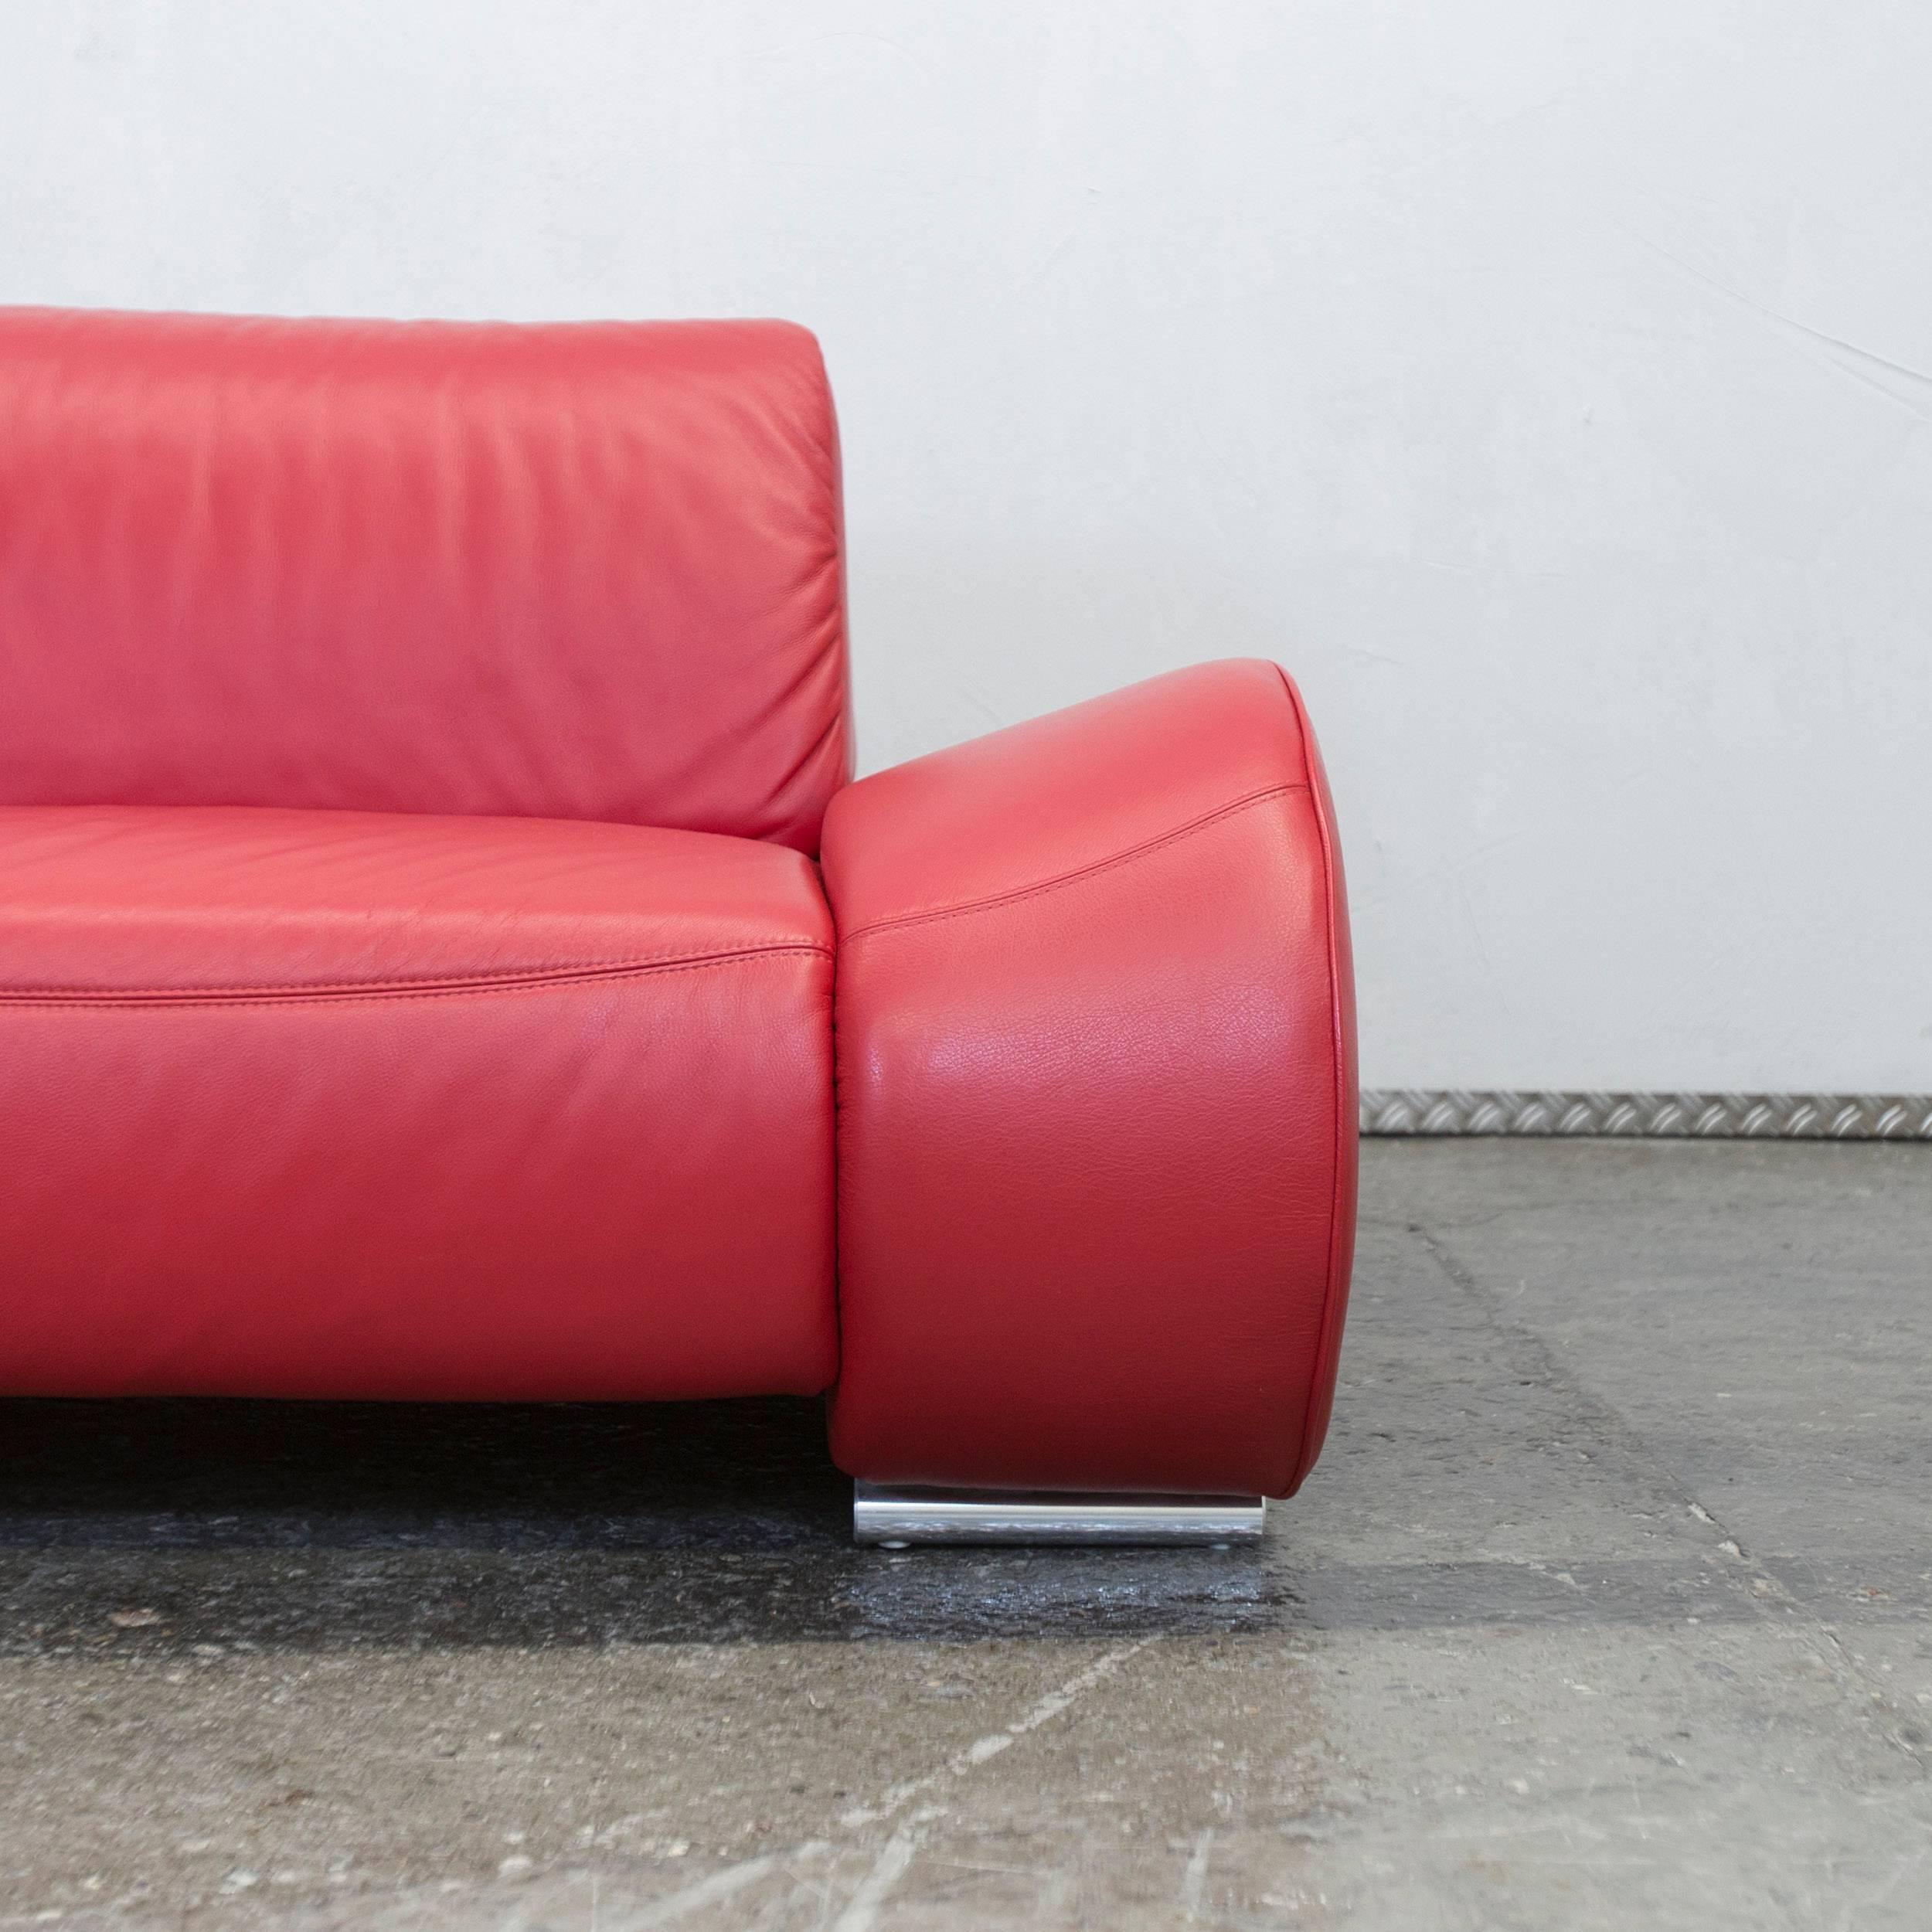 Designer Leder leder rot size of sofa ledersofa sofa leder rot rote